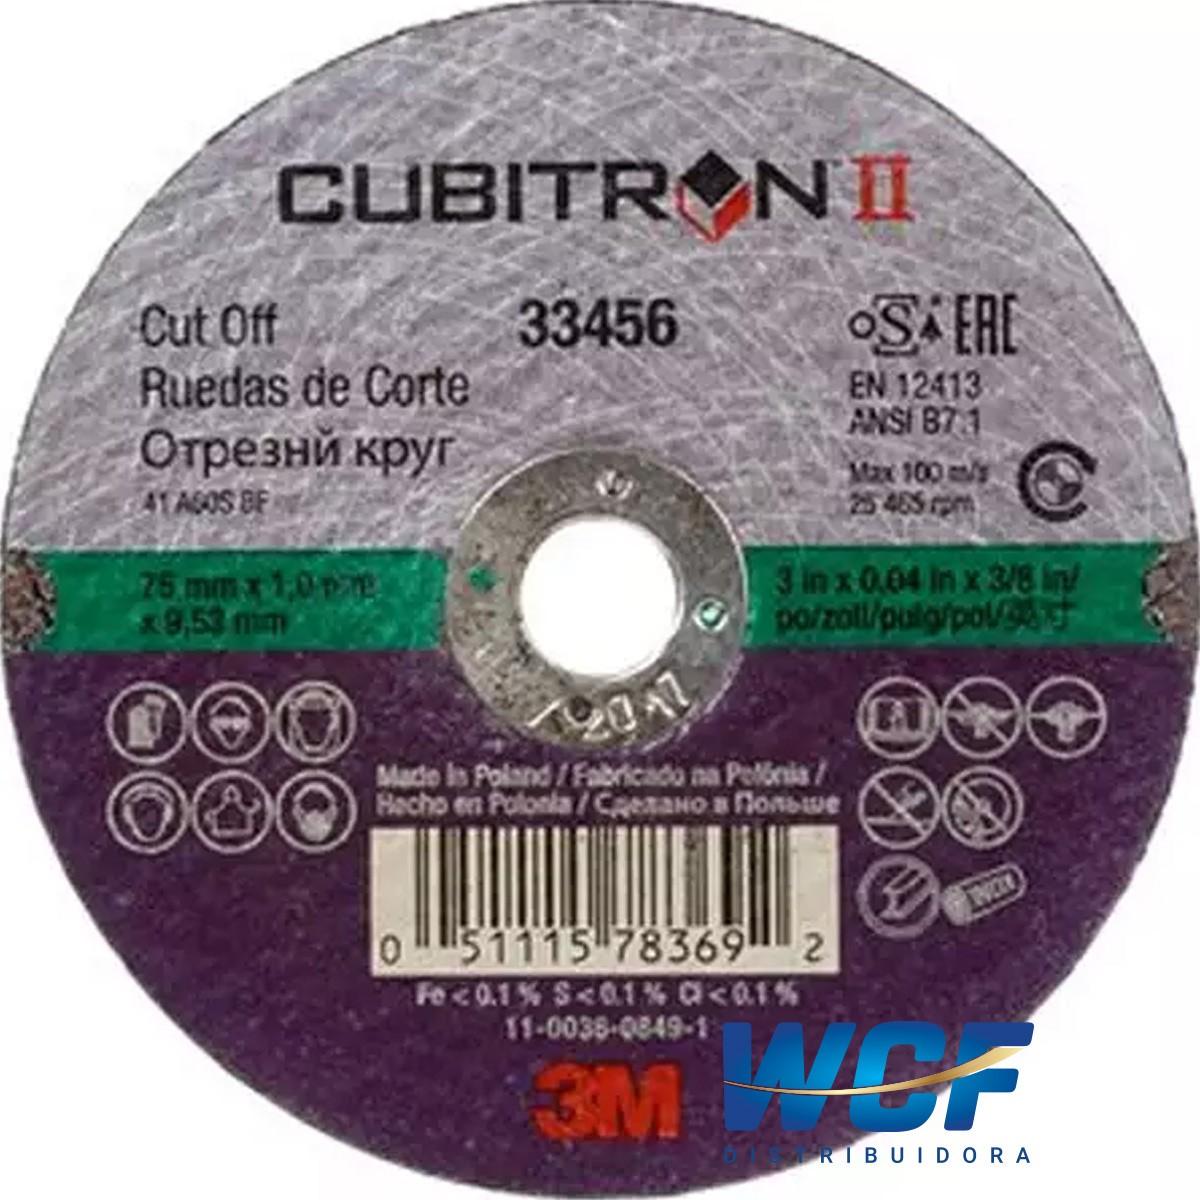 3M DISCO CORTE CUBITRON 75MM